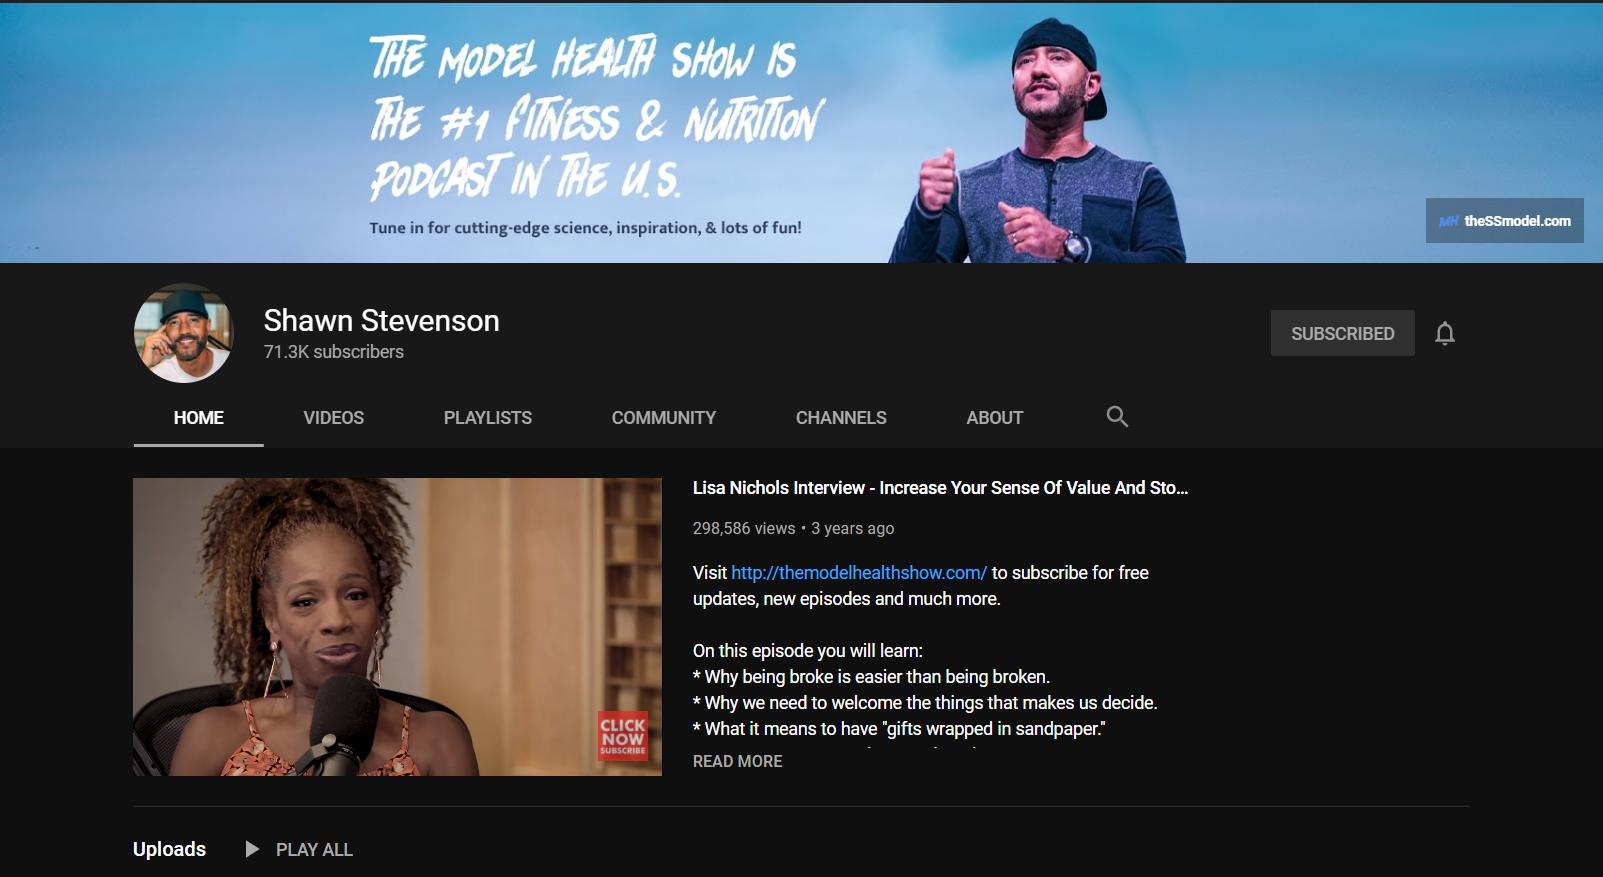 The Model Health Show by Shawn Stevenson